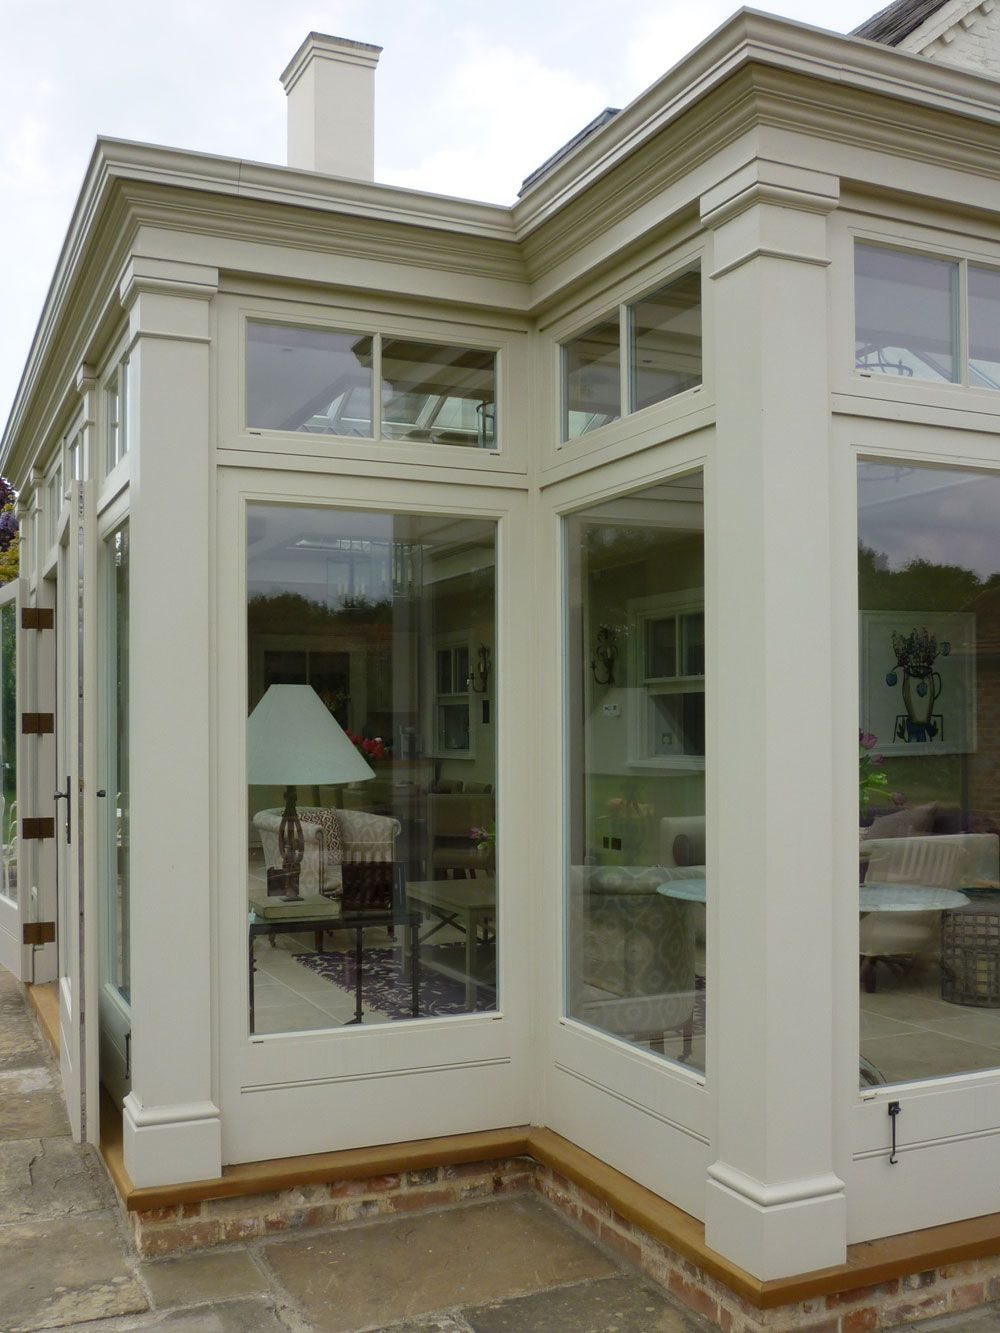 3 season porch window ideas  must see popular  season room design ideas plans u cost estimation